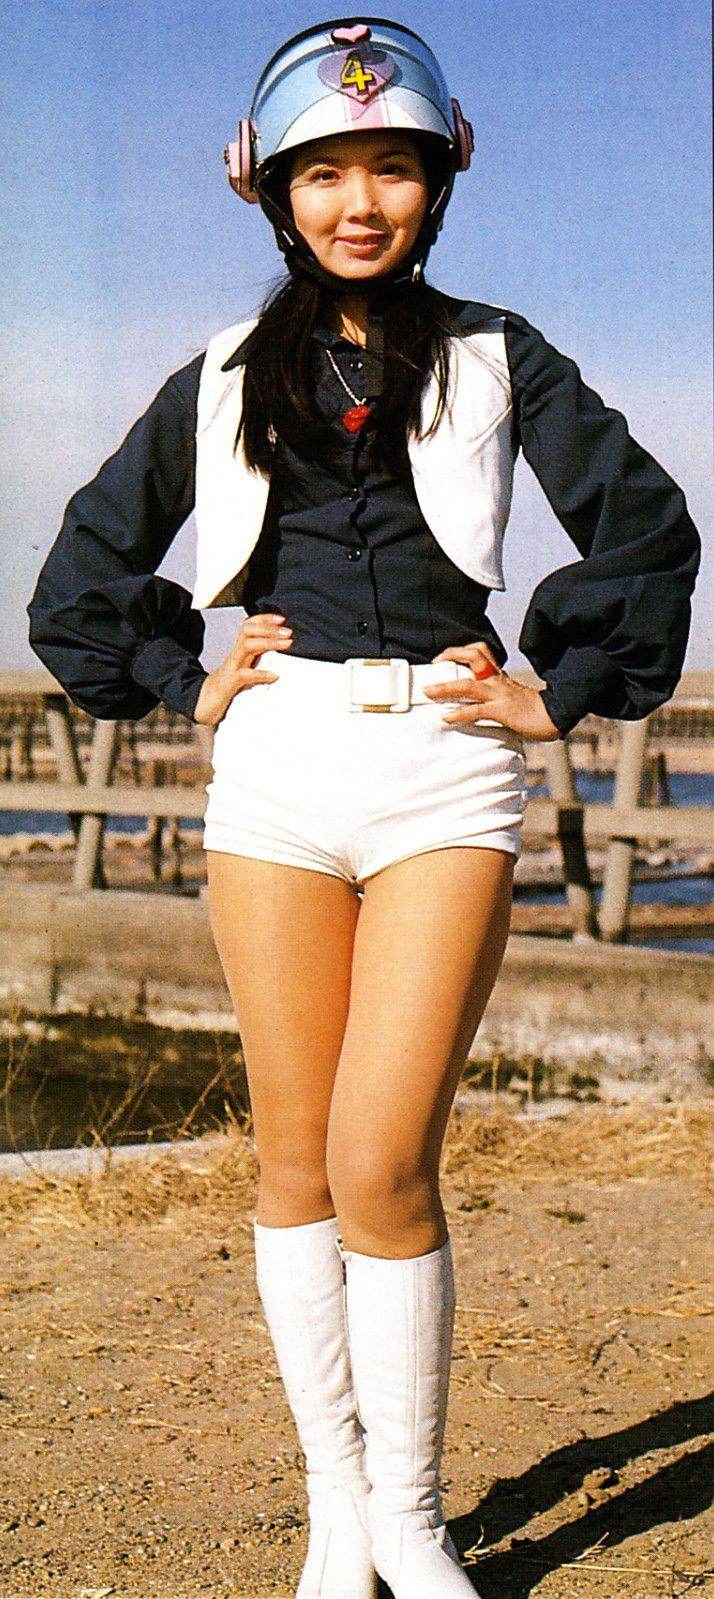 003.jpg 秘密戦隊ゴレンジャー/モモレンジャー/ペギー松山〈演:小牧リサ〉1975年~1977年